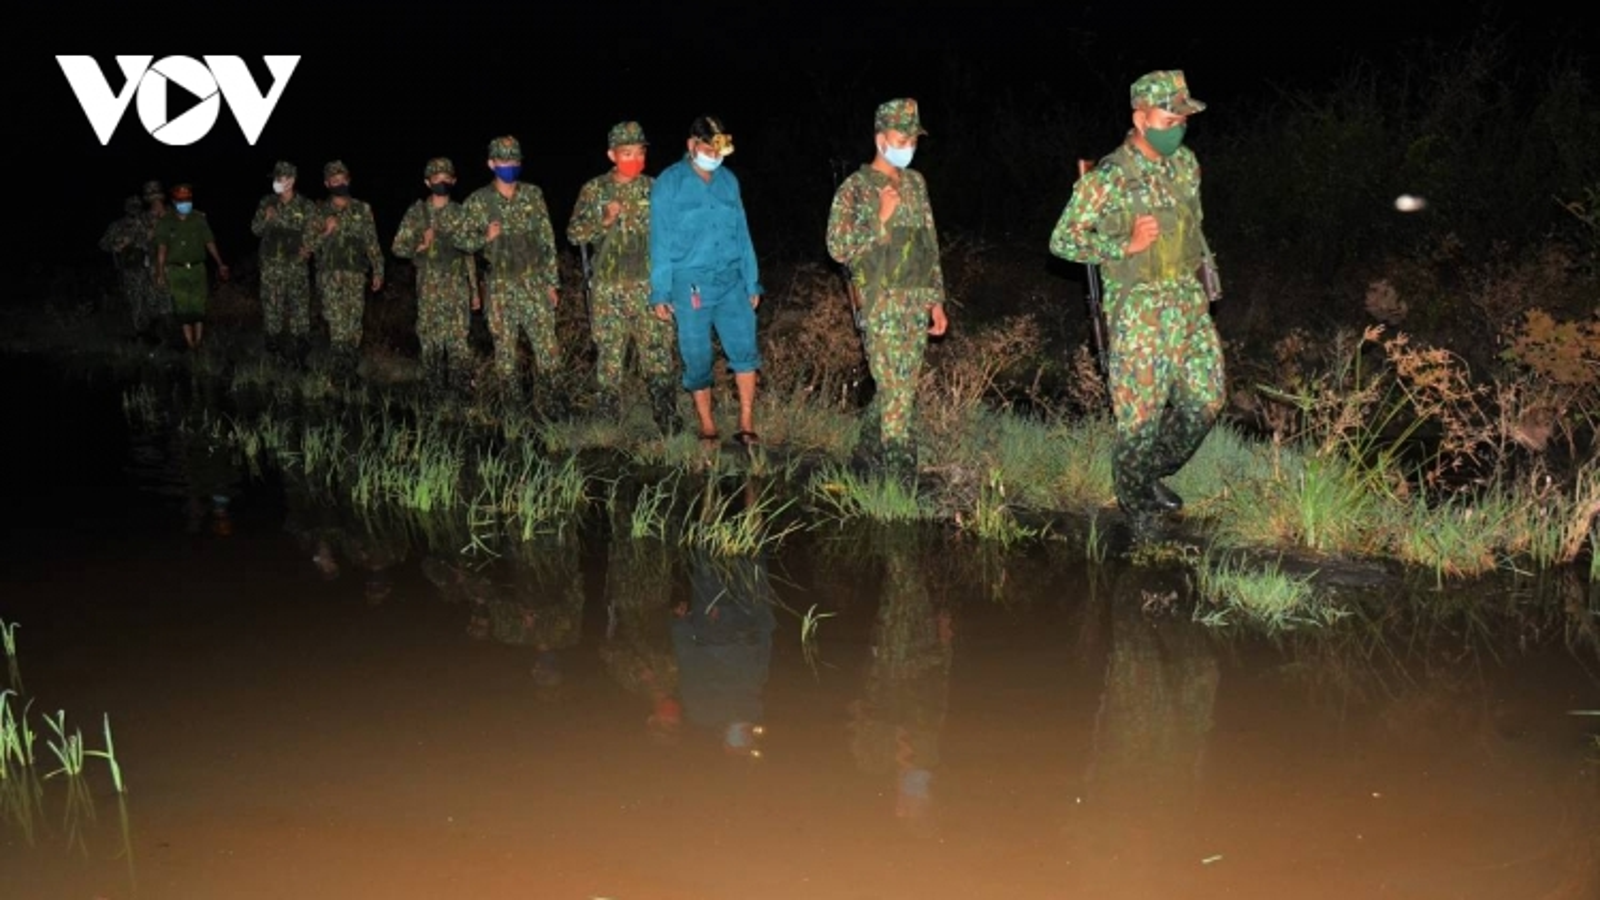 Troops deployed to southwestern border amid rising coronavirus threats